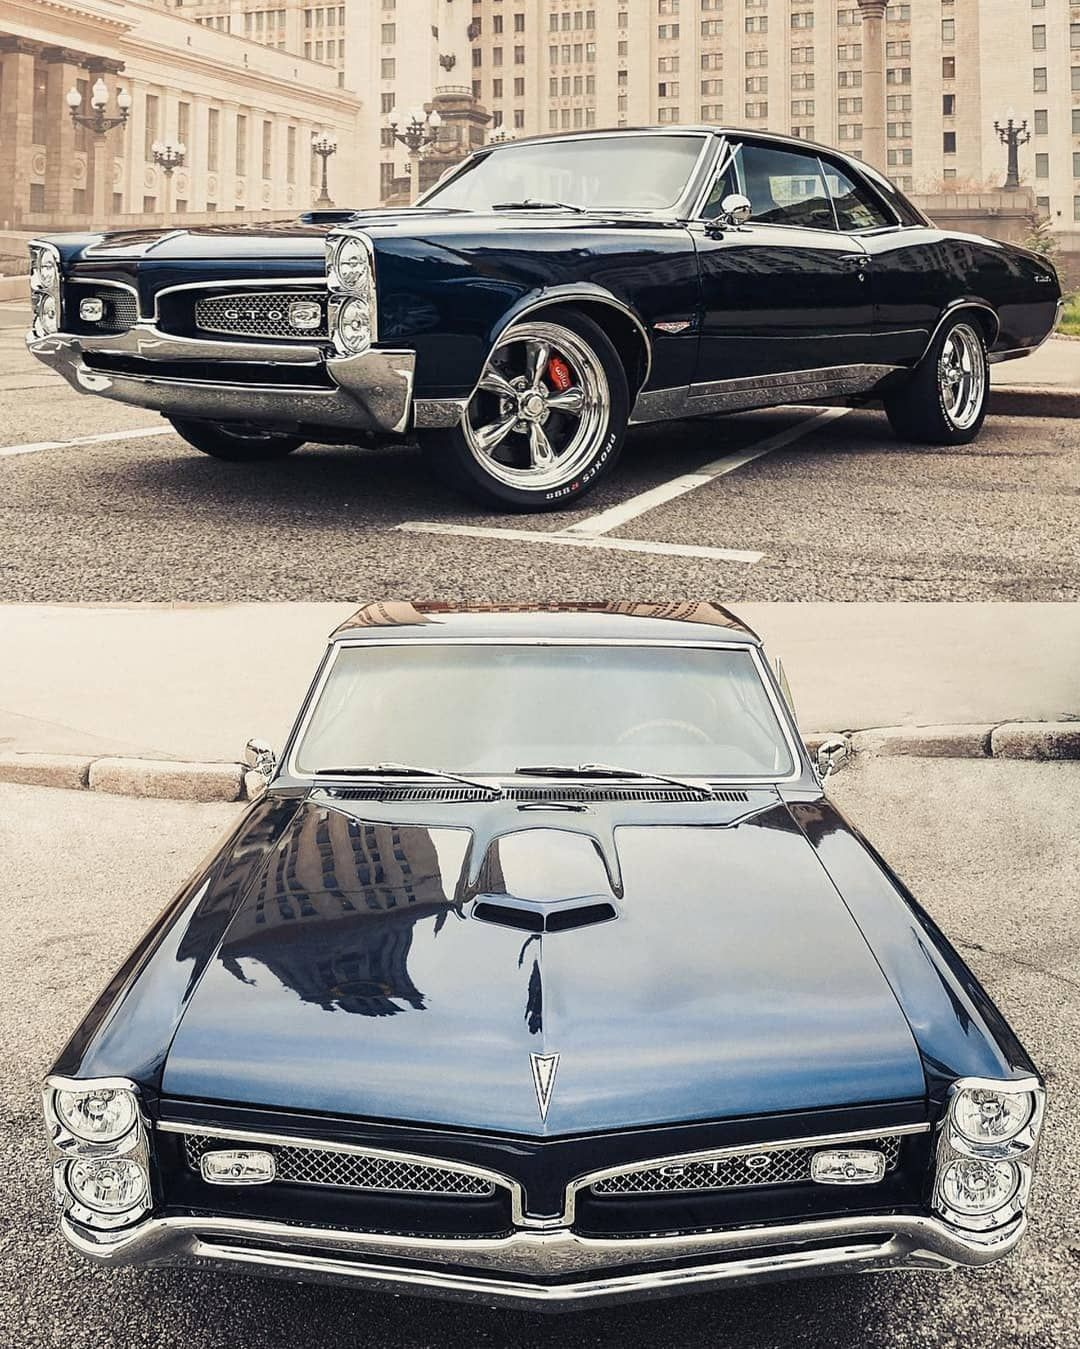 "🇺🇸 Classics Daily 🇺🇸 on Instagram: ""'67 Pontiac GTO! _ @pontiac_gto_1967 #pontiac #GTO #americanmuscle #musclecar  #classic #restomod #speed #vehicles  #cargram #carstagram…"""